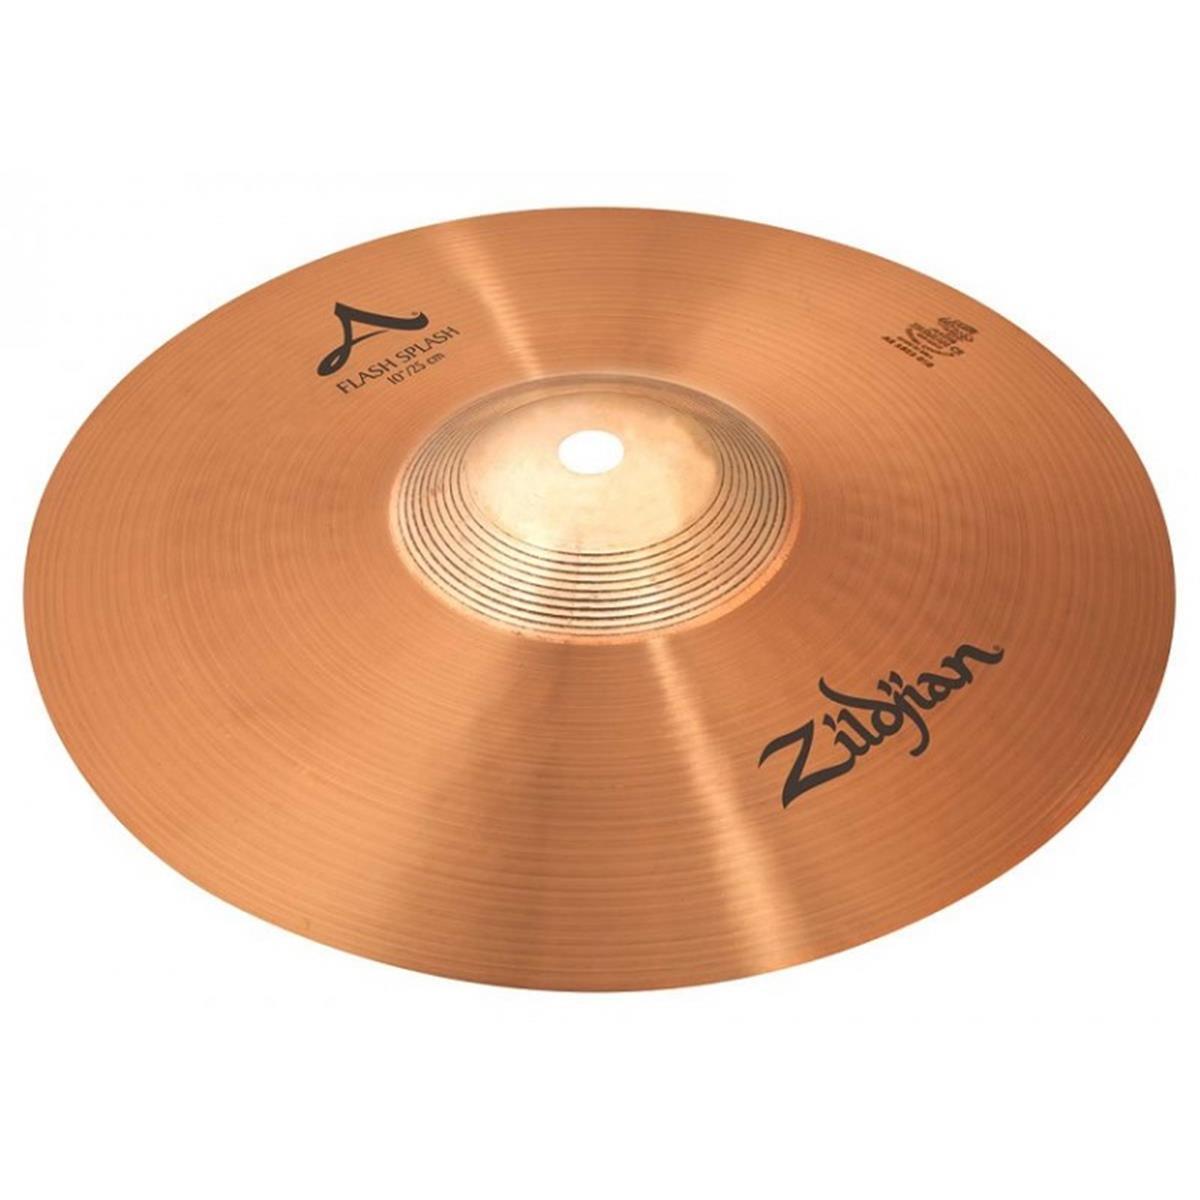 Zildjian-A-series-Avedis-10-A-Flash-Splash-cm-25-sku-9022056203178